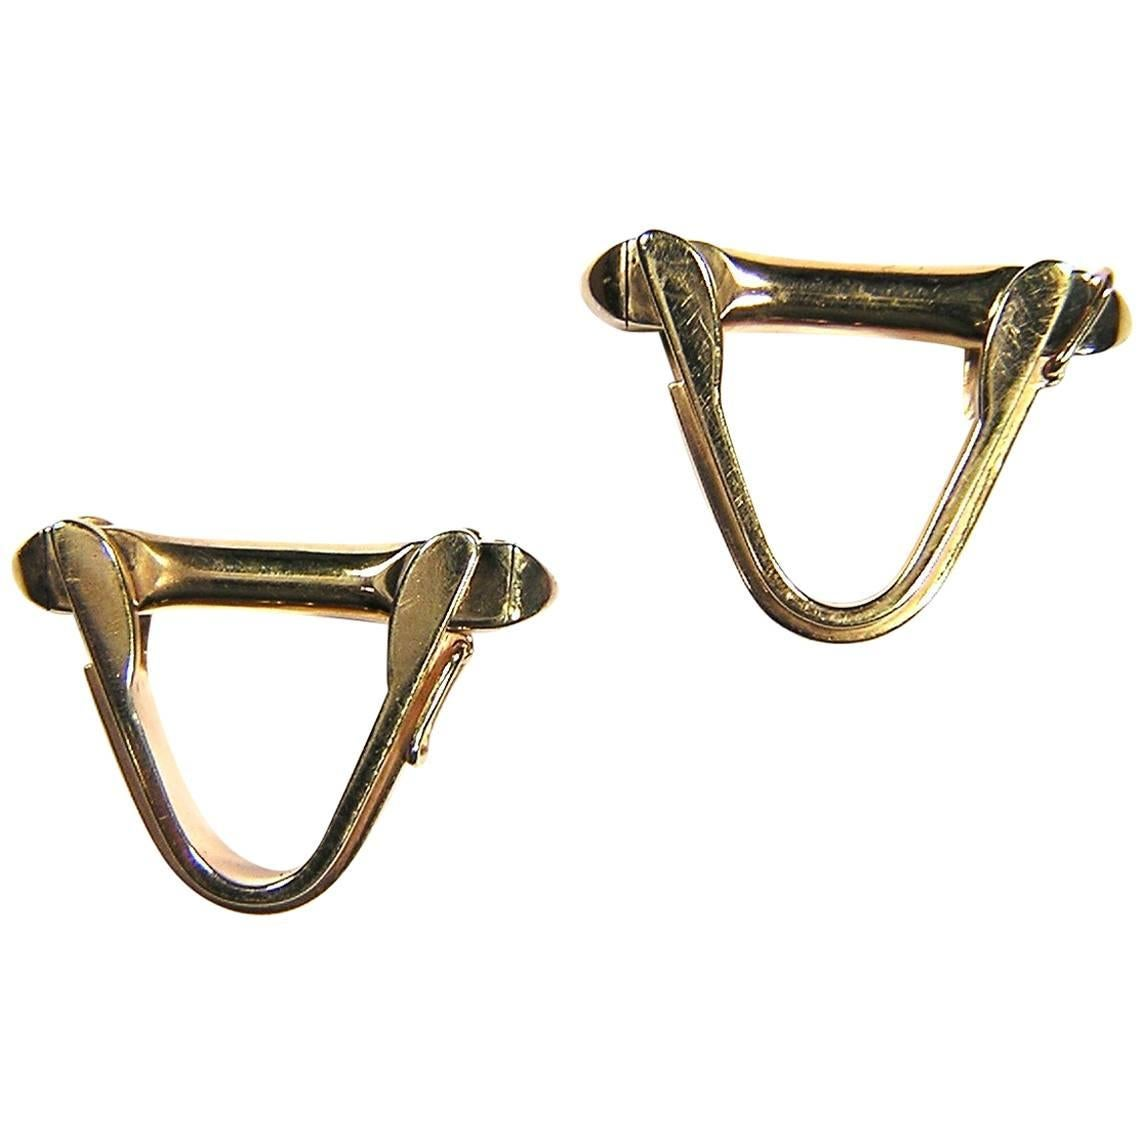 1930s Yellow Gold Stirrup Cufflinks